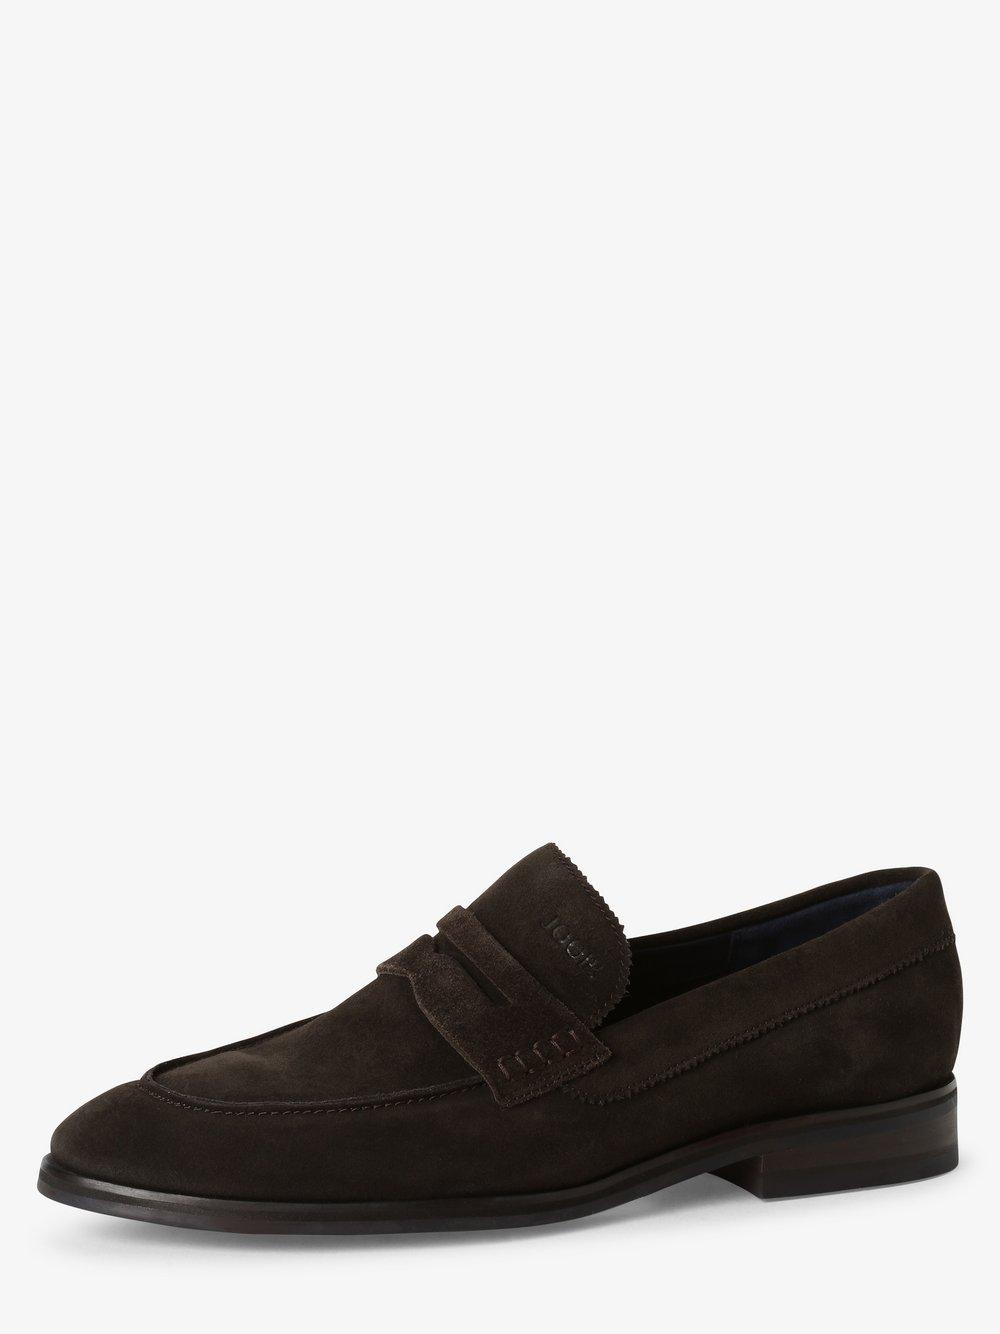 Joop - Skórzane loafersy męskie – Velluto, niebieski